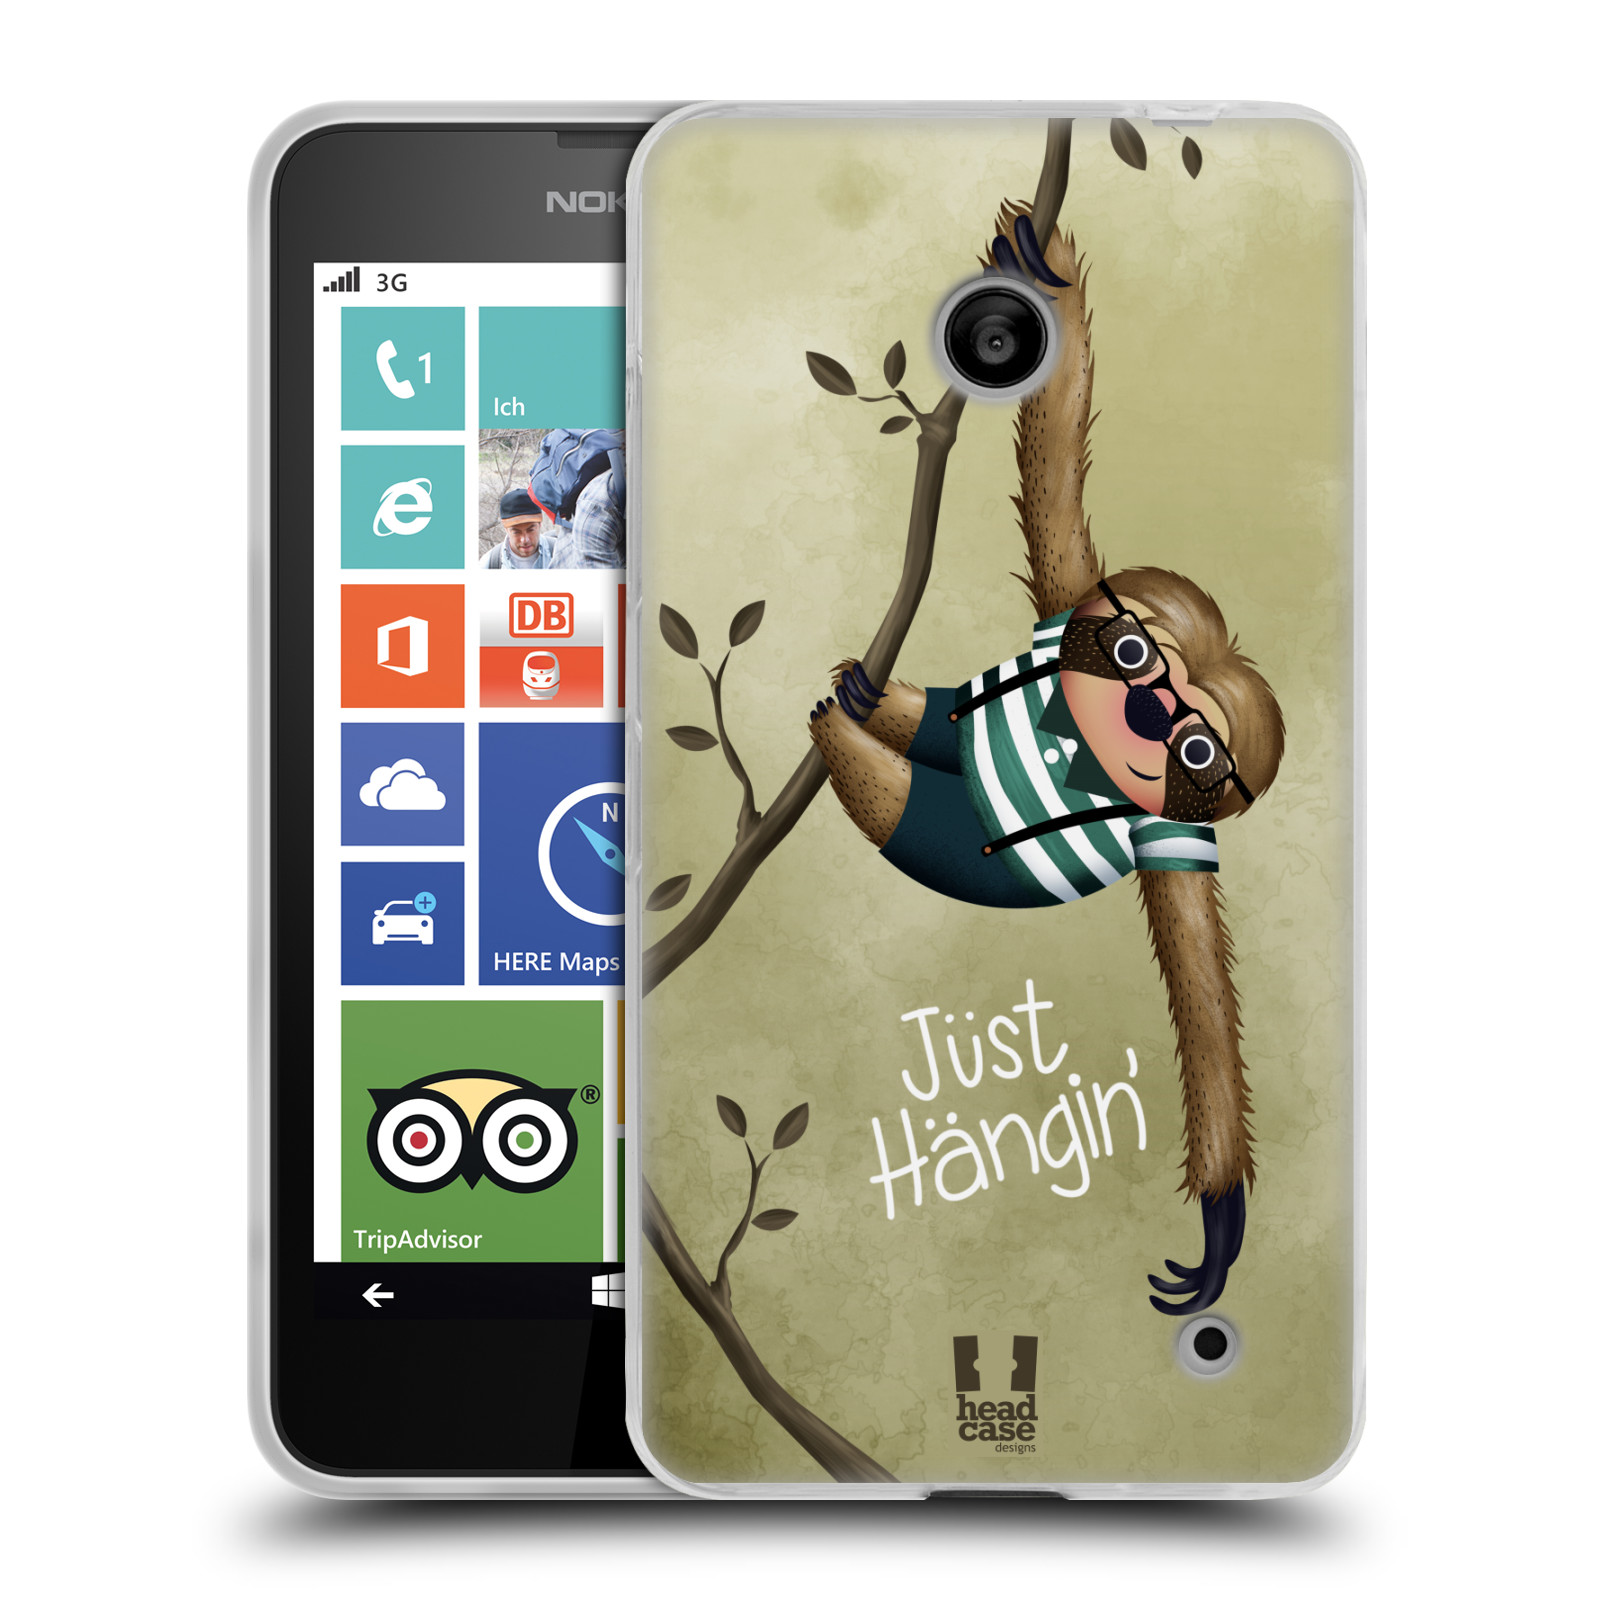 Silikonové pouzdro na mobil Nokia Lumia 630 HEAD CASE Lenochod Just Hangin (Silikonový kryt či obal na mobilní telefon Nokia Lumia 630 a Nokia Lumia 630 Dual SIM)